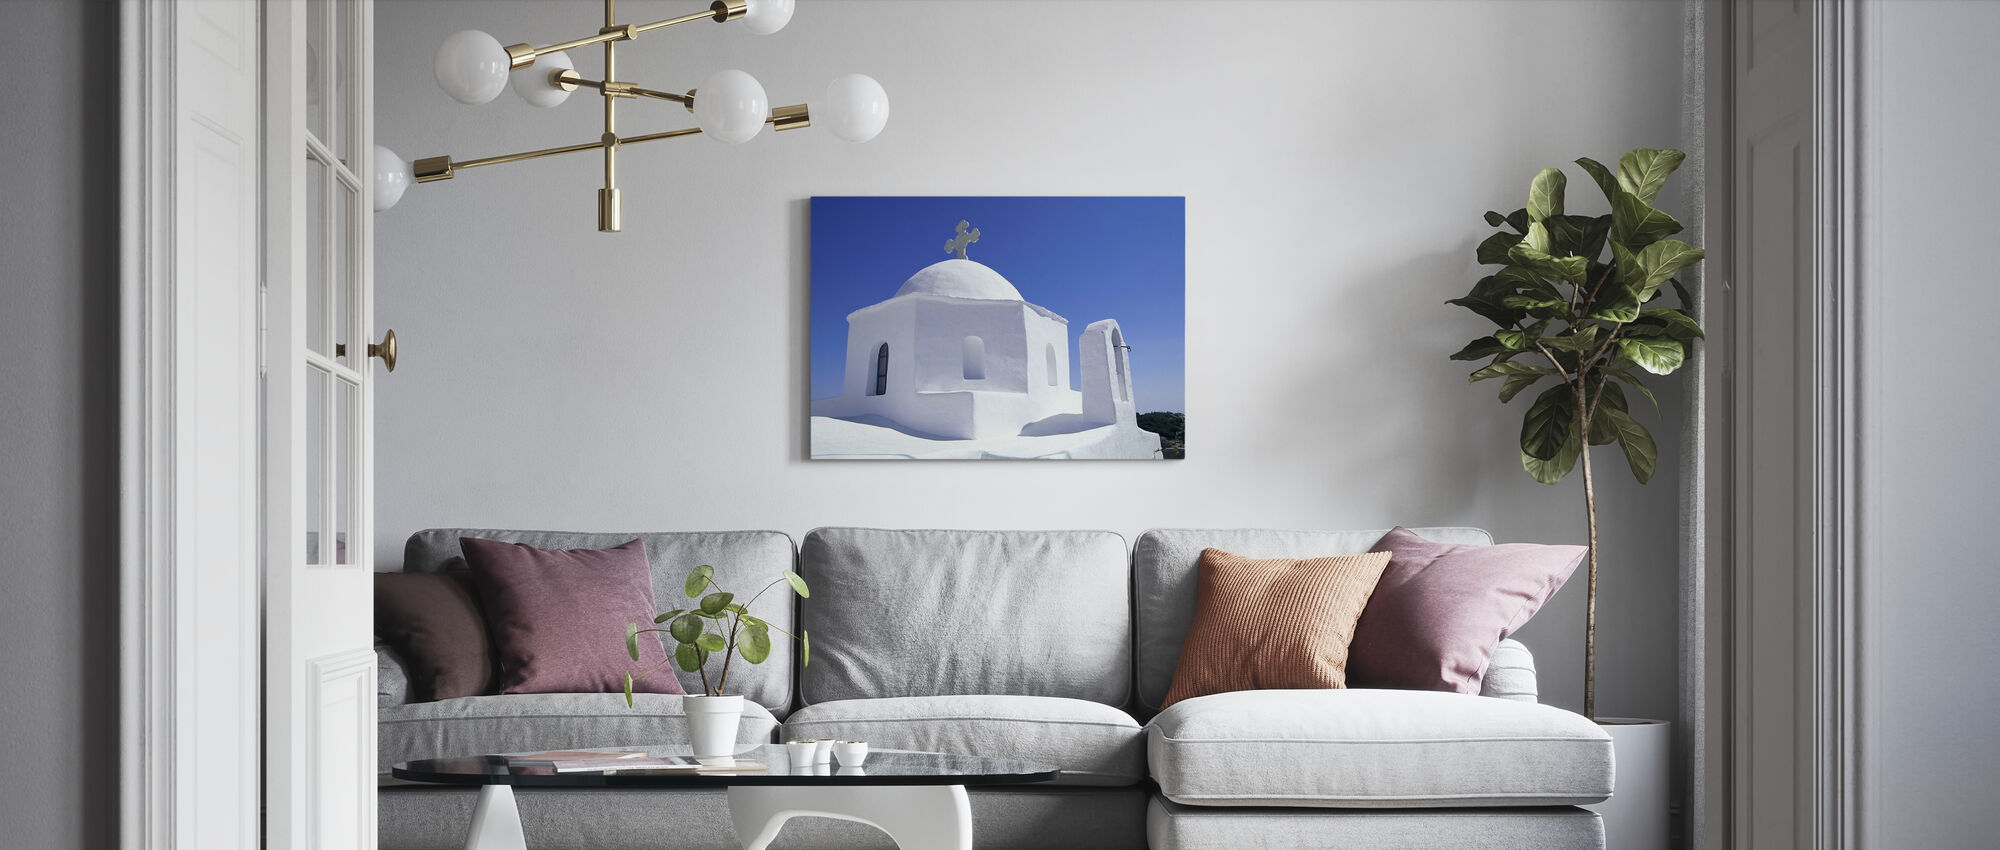 Greece Building - Canvas print - Living Room